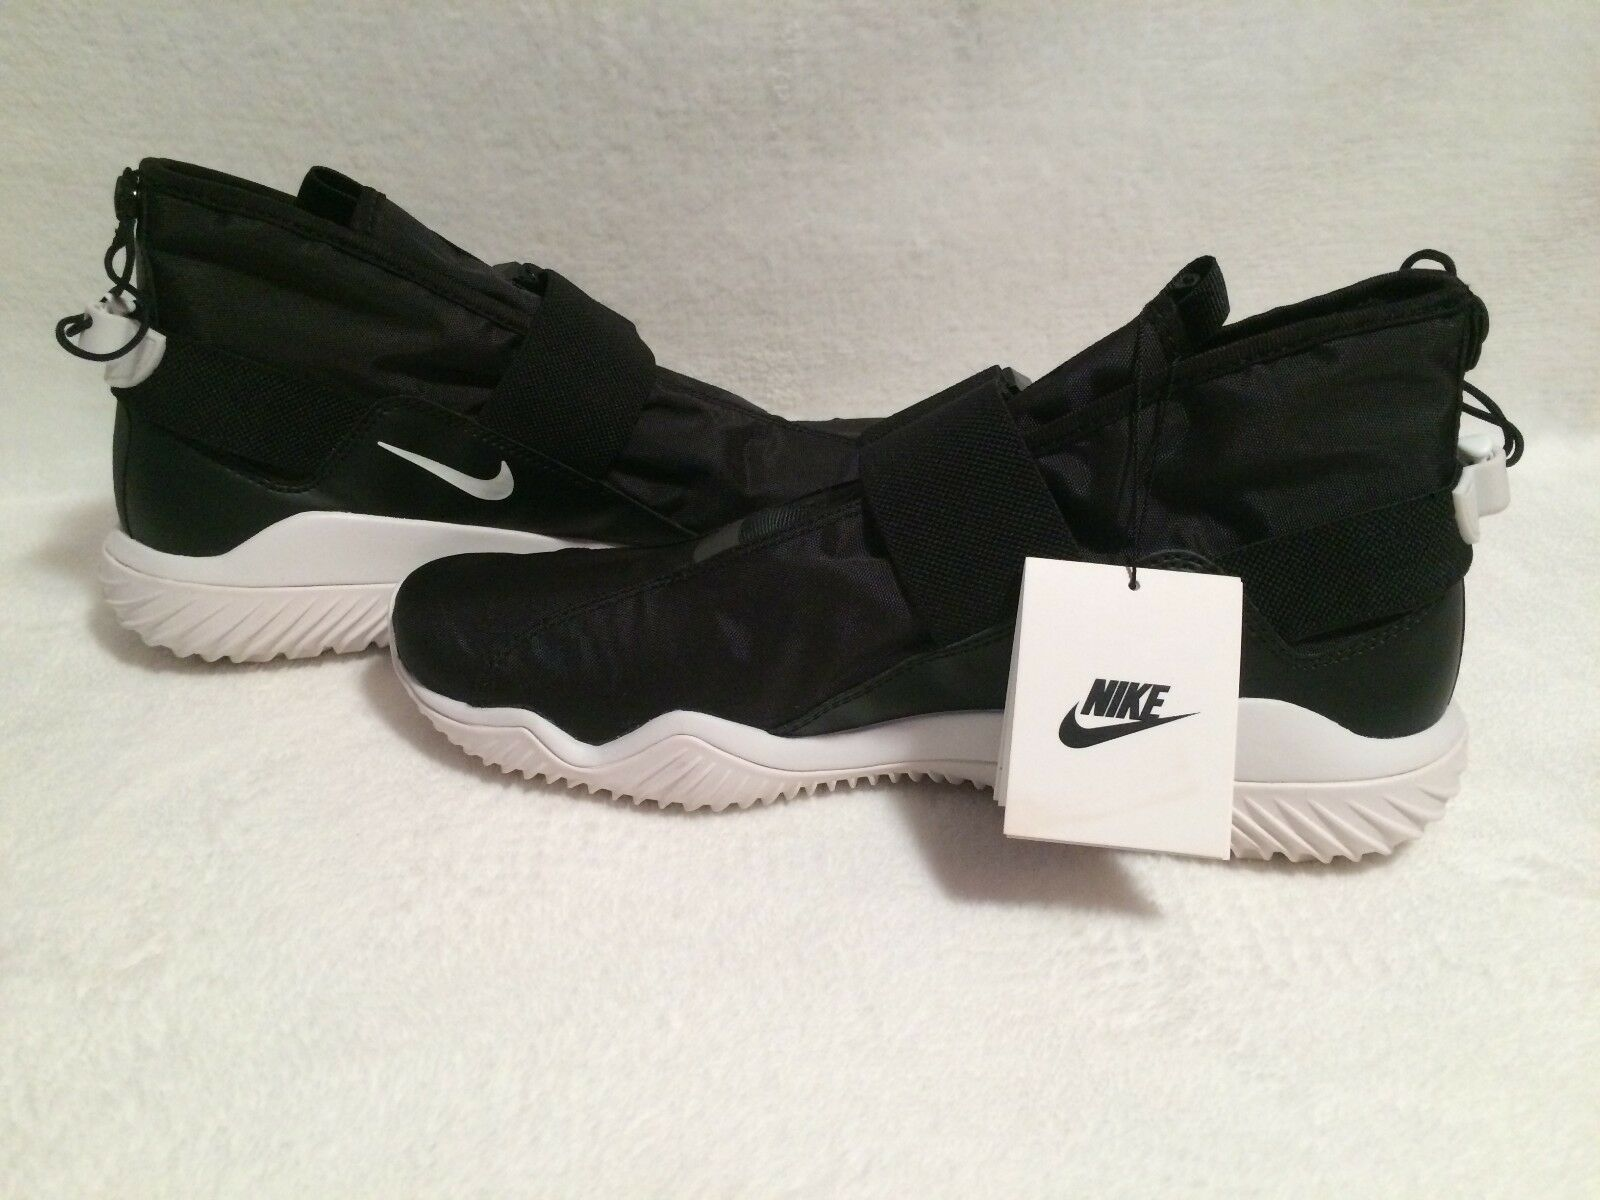 Nike air huarache nuovi all-grey [318429-033. noi uomini sz